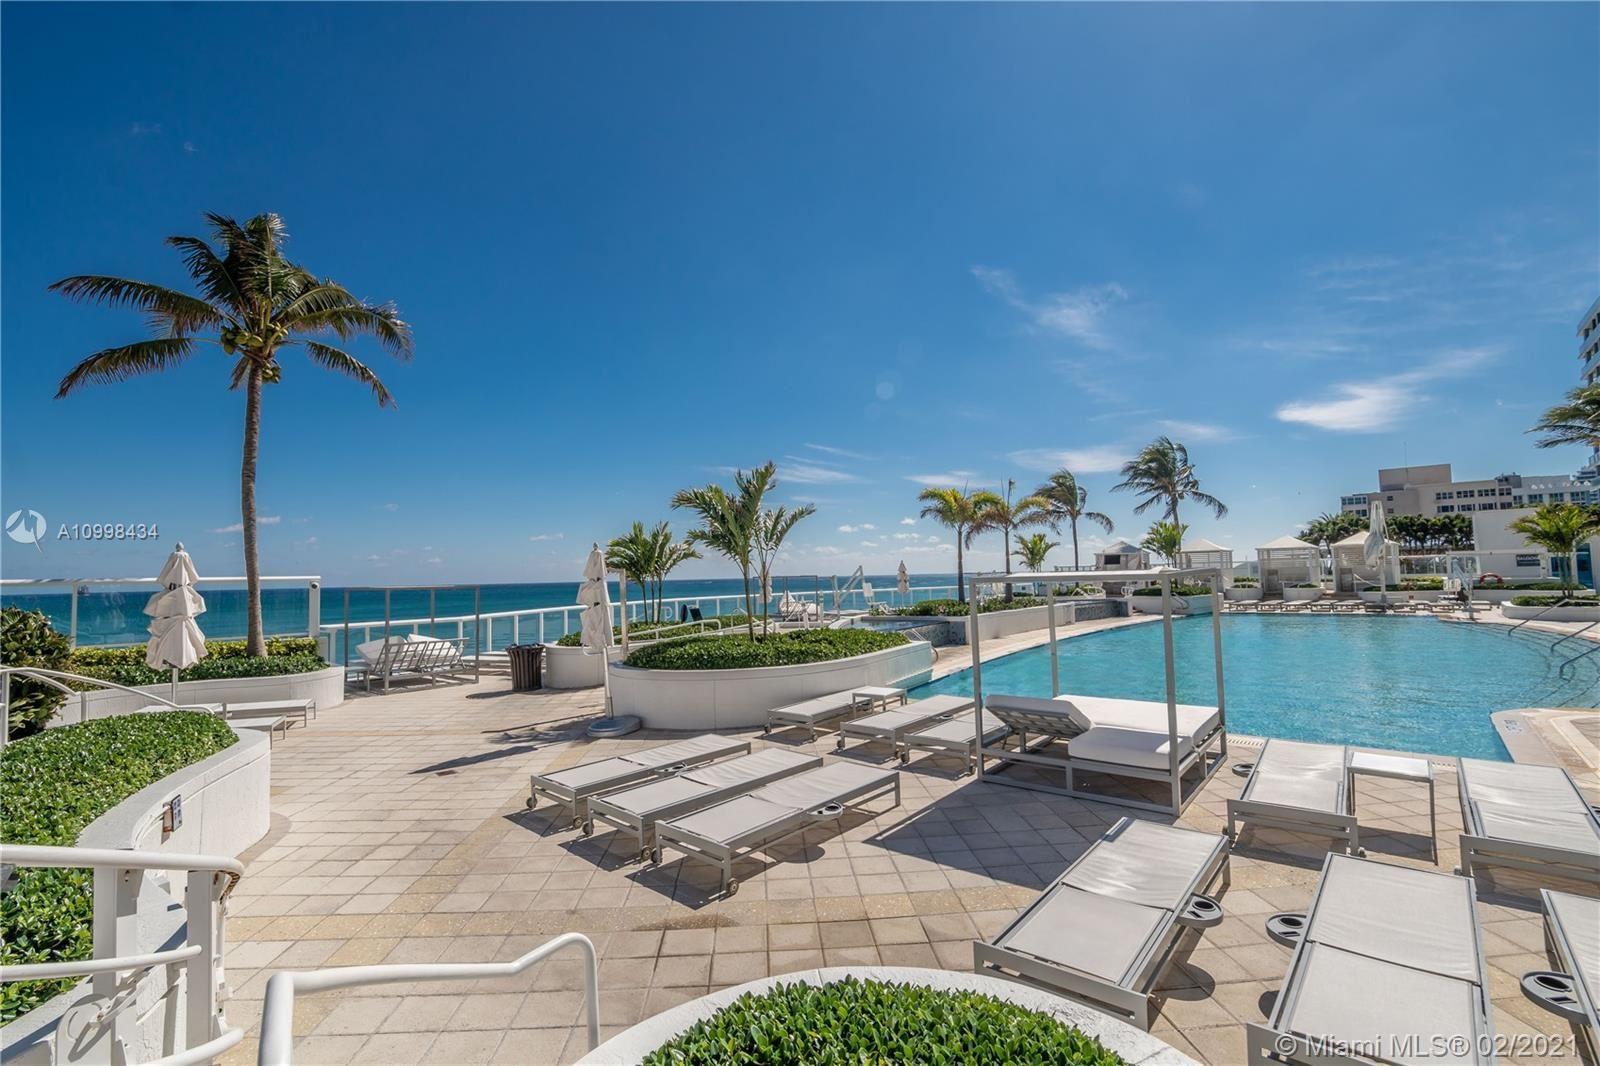 505 N Fort Lauderdale Beach Blvd #1115, Fort Lauderdale, FL 33304 - #: A10998434